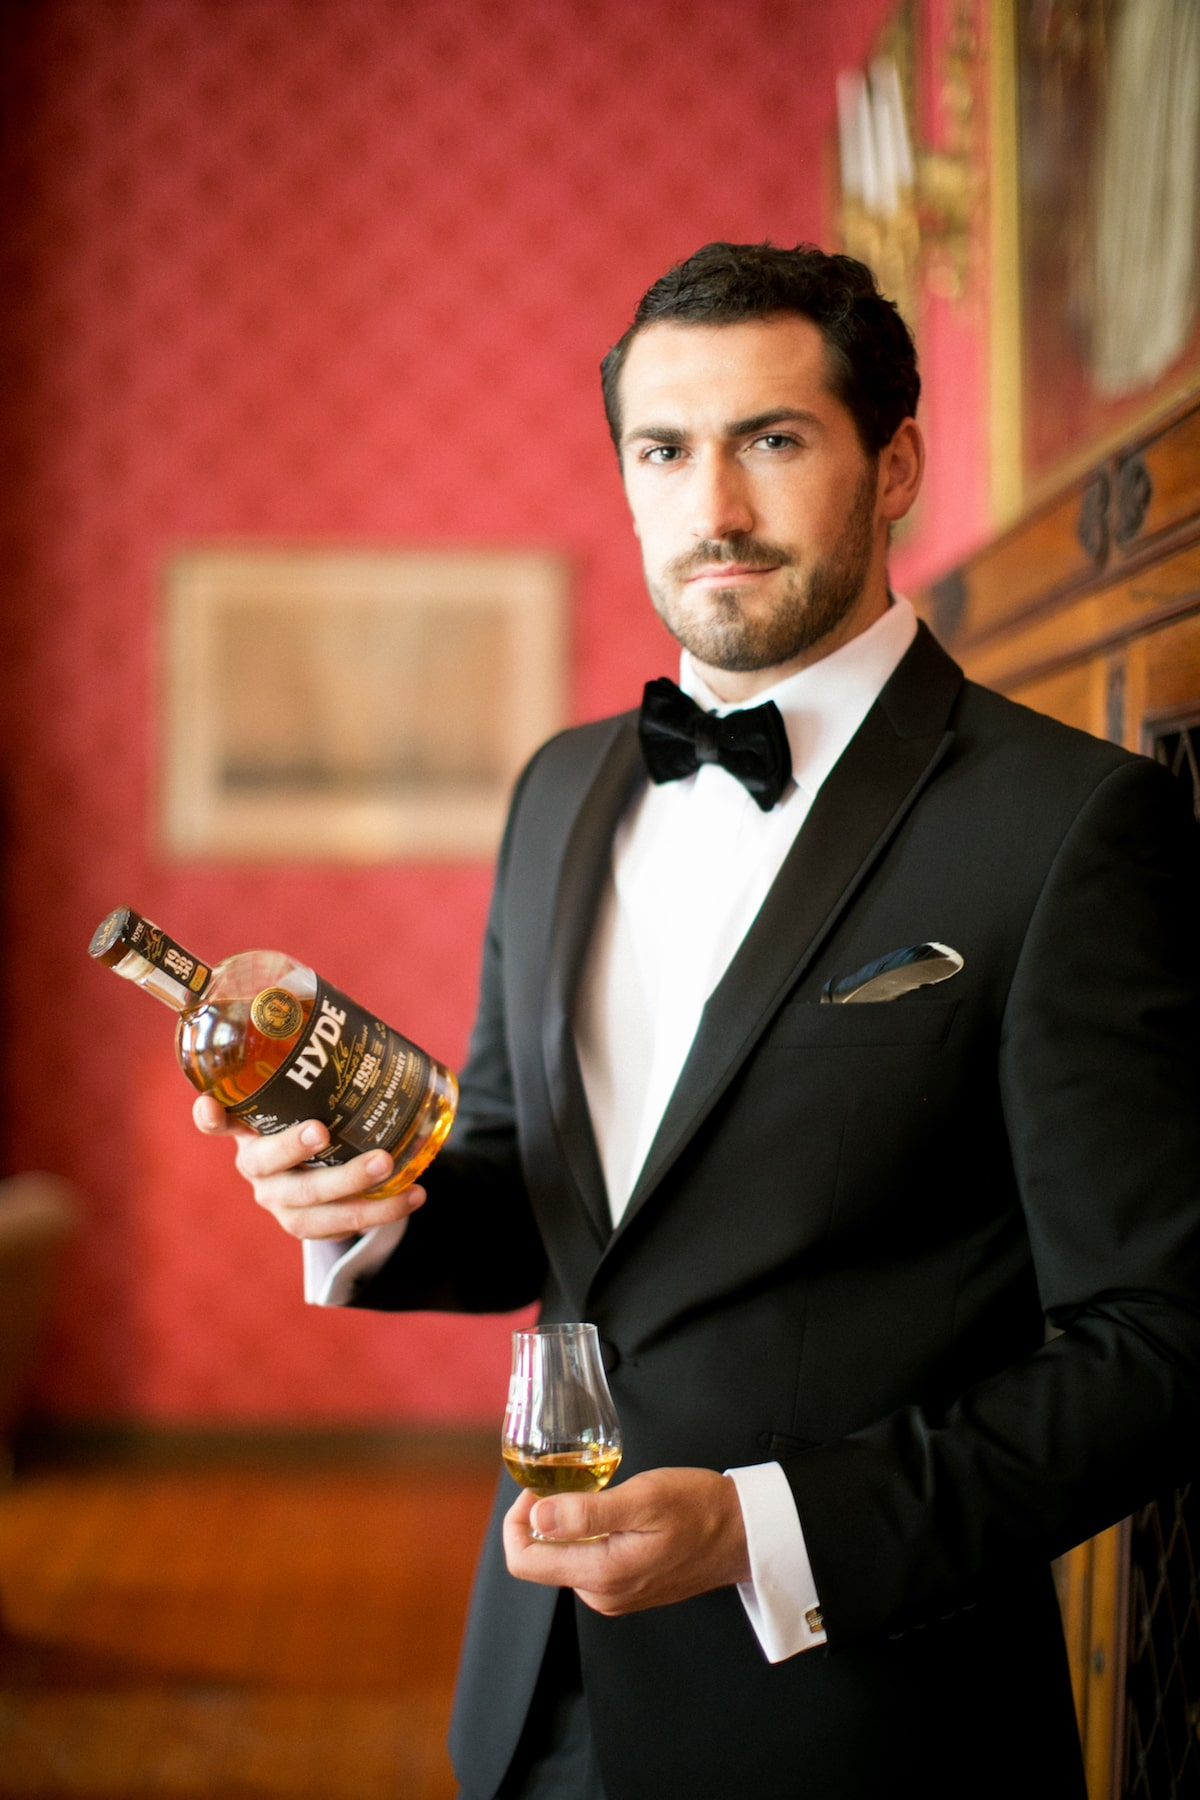 Irish Drinks for a Wedding Bar